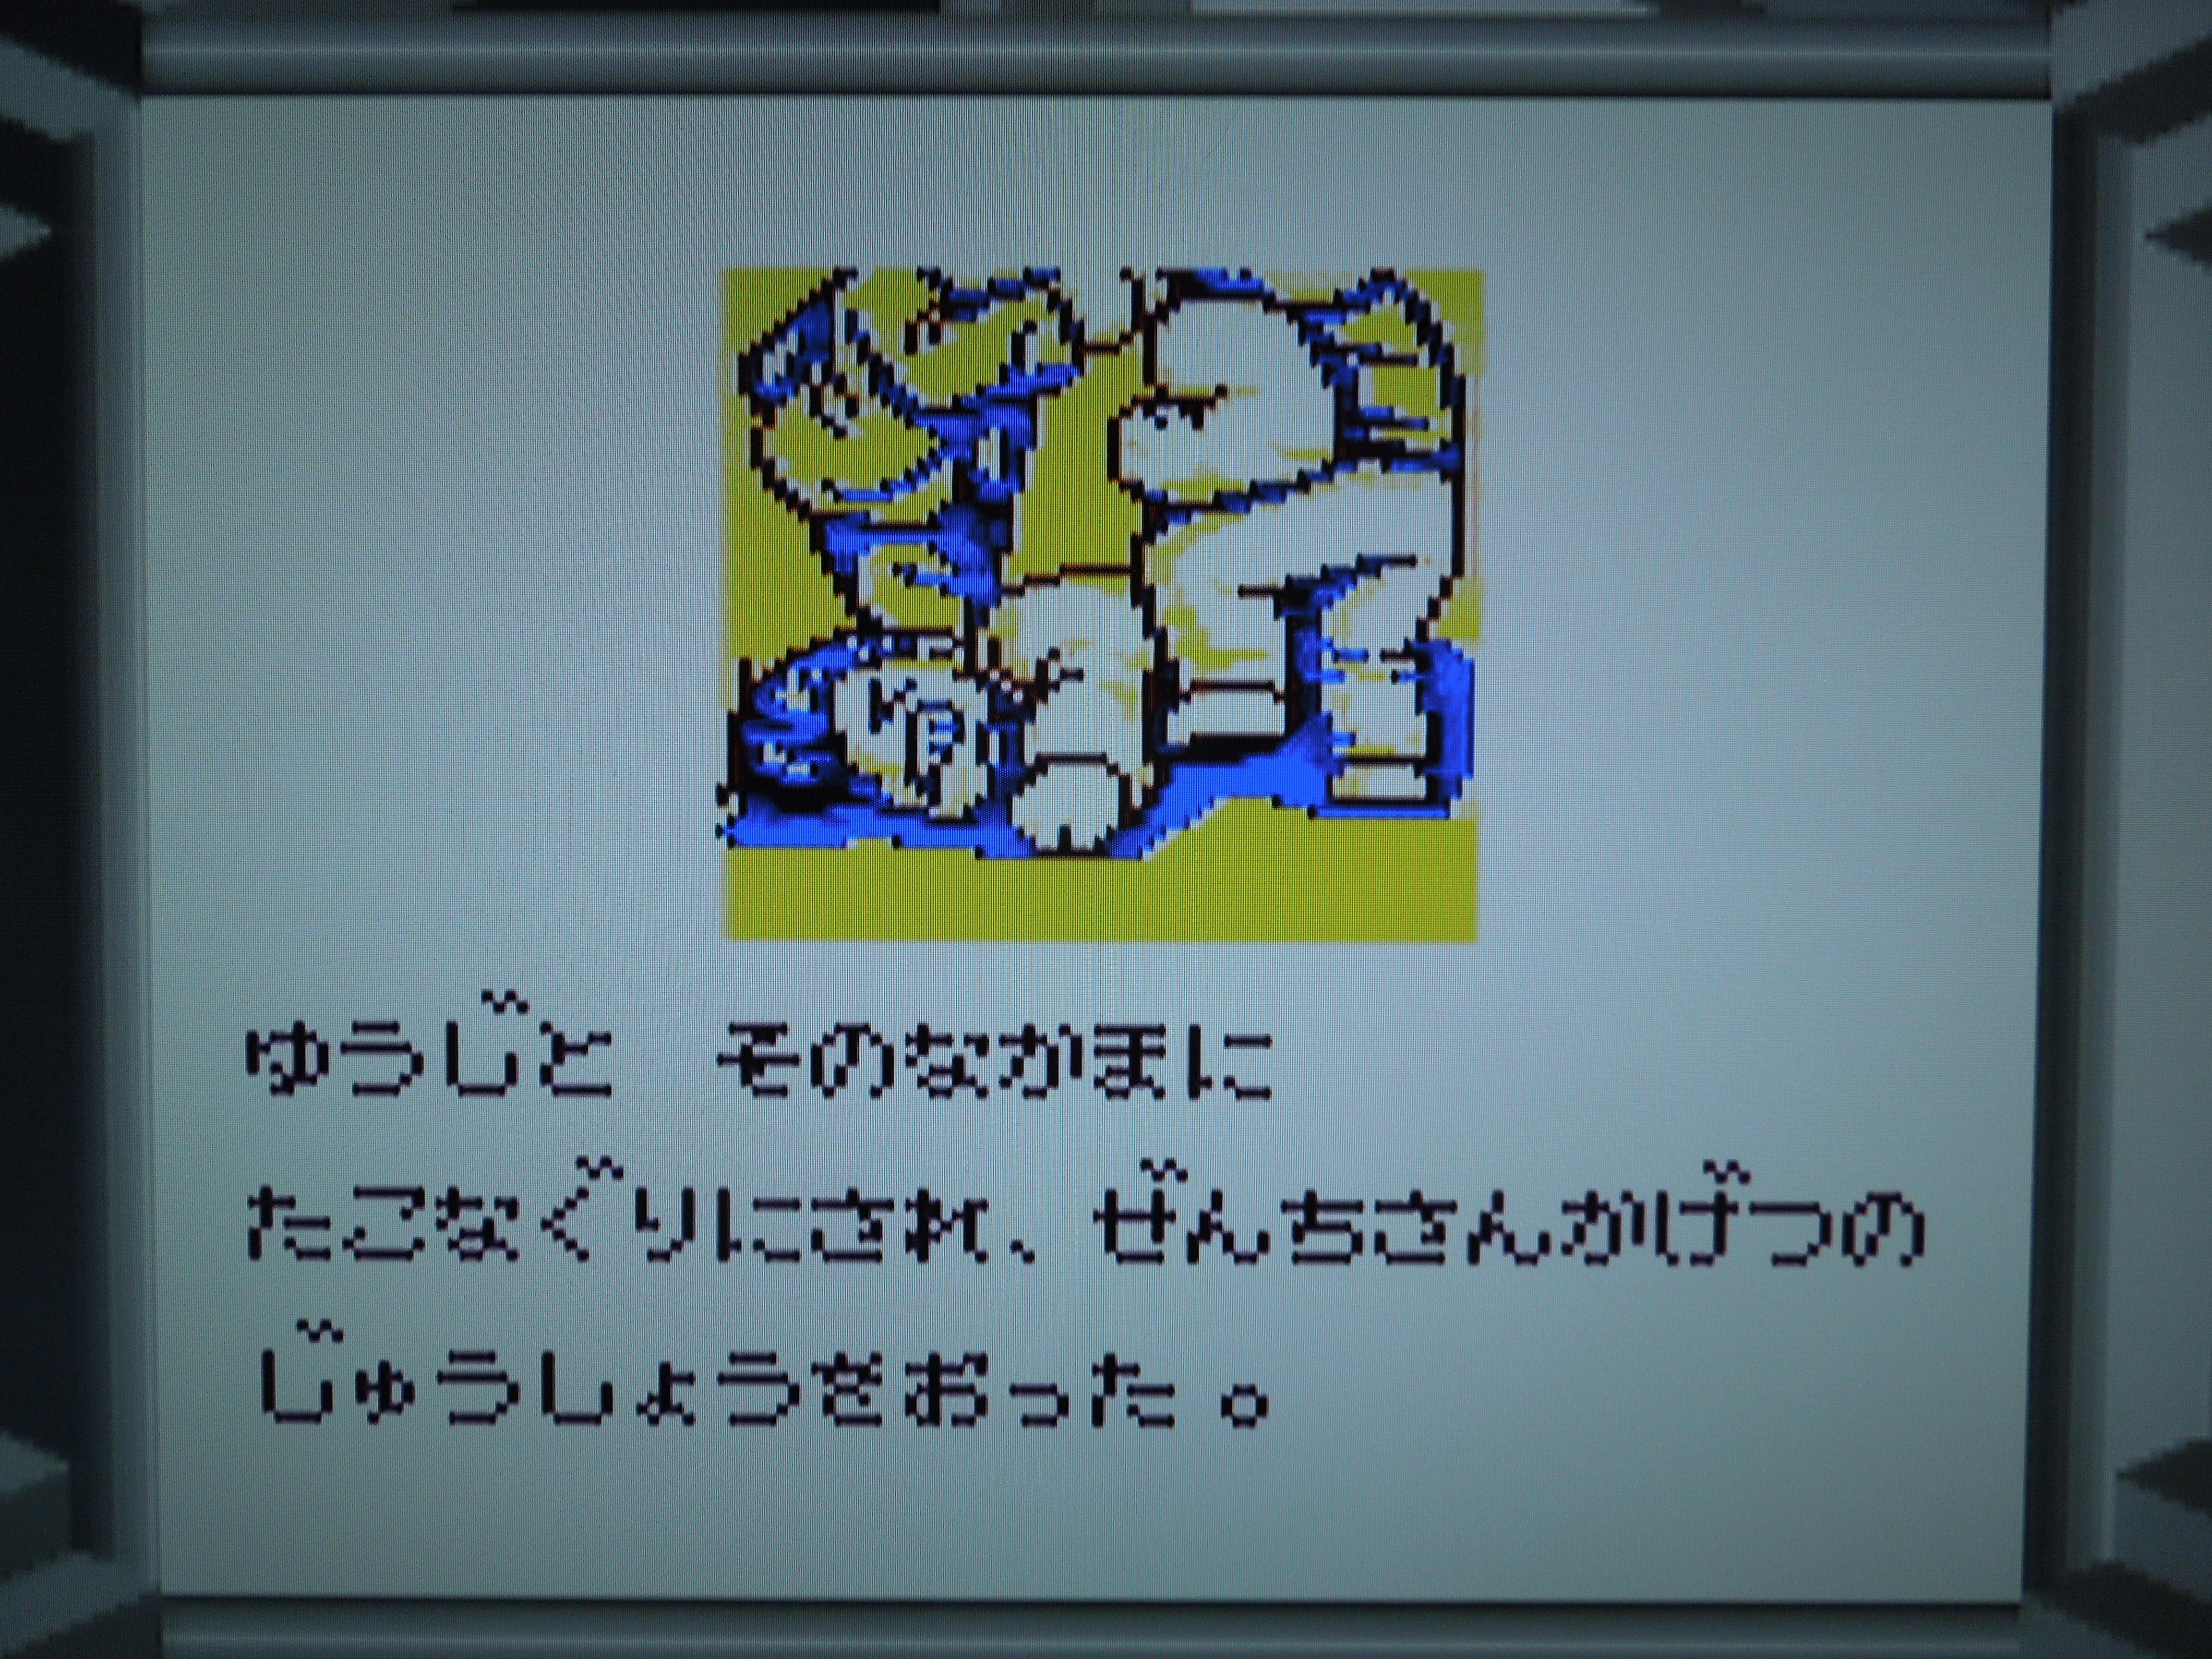 Game Boy Nekketsu Bangai Ranto Hen Obscure Video Games Buddy Gang Kunios Hiro Gets Sent To The Hospital And Kunio Seeks Revenge